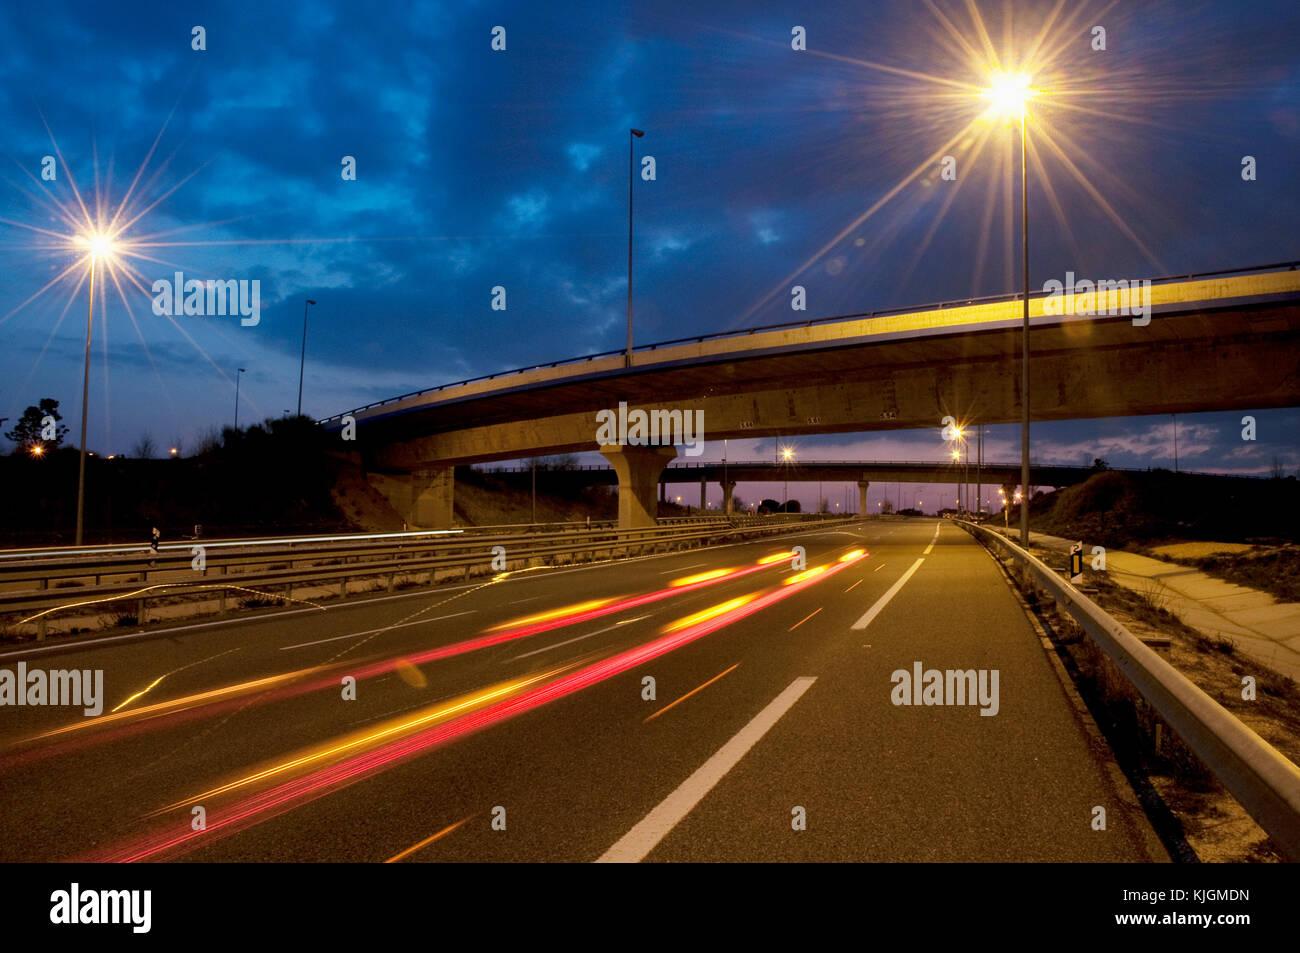 R-3 toll motorway at dusk. Madrid, Spain. Stock Photo